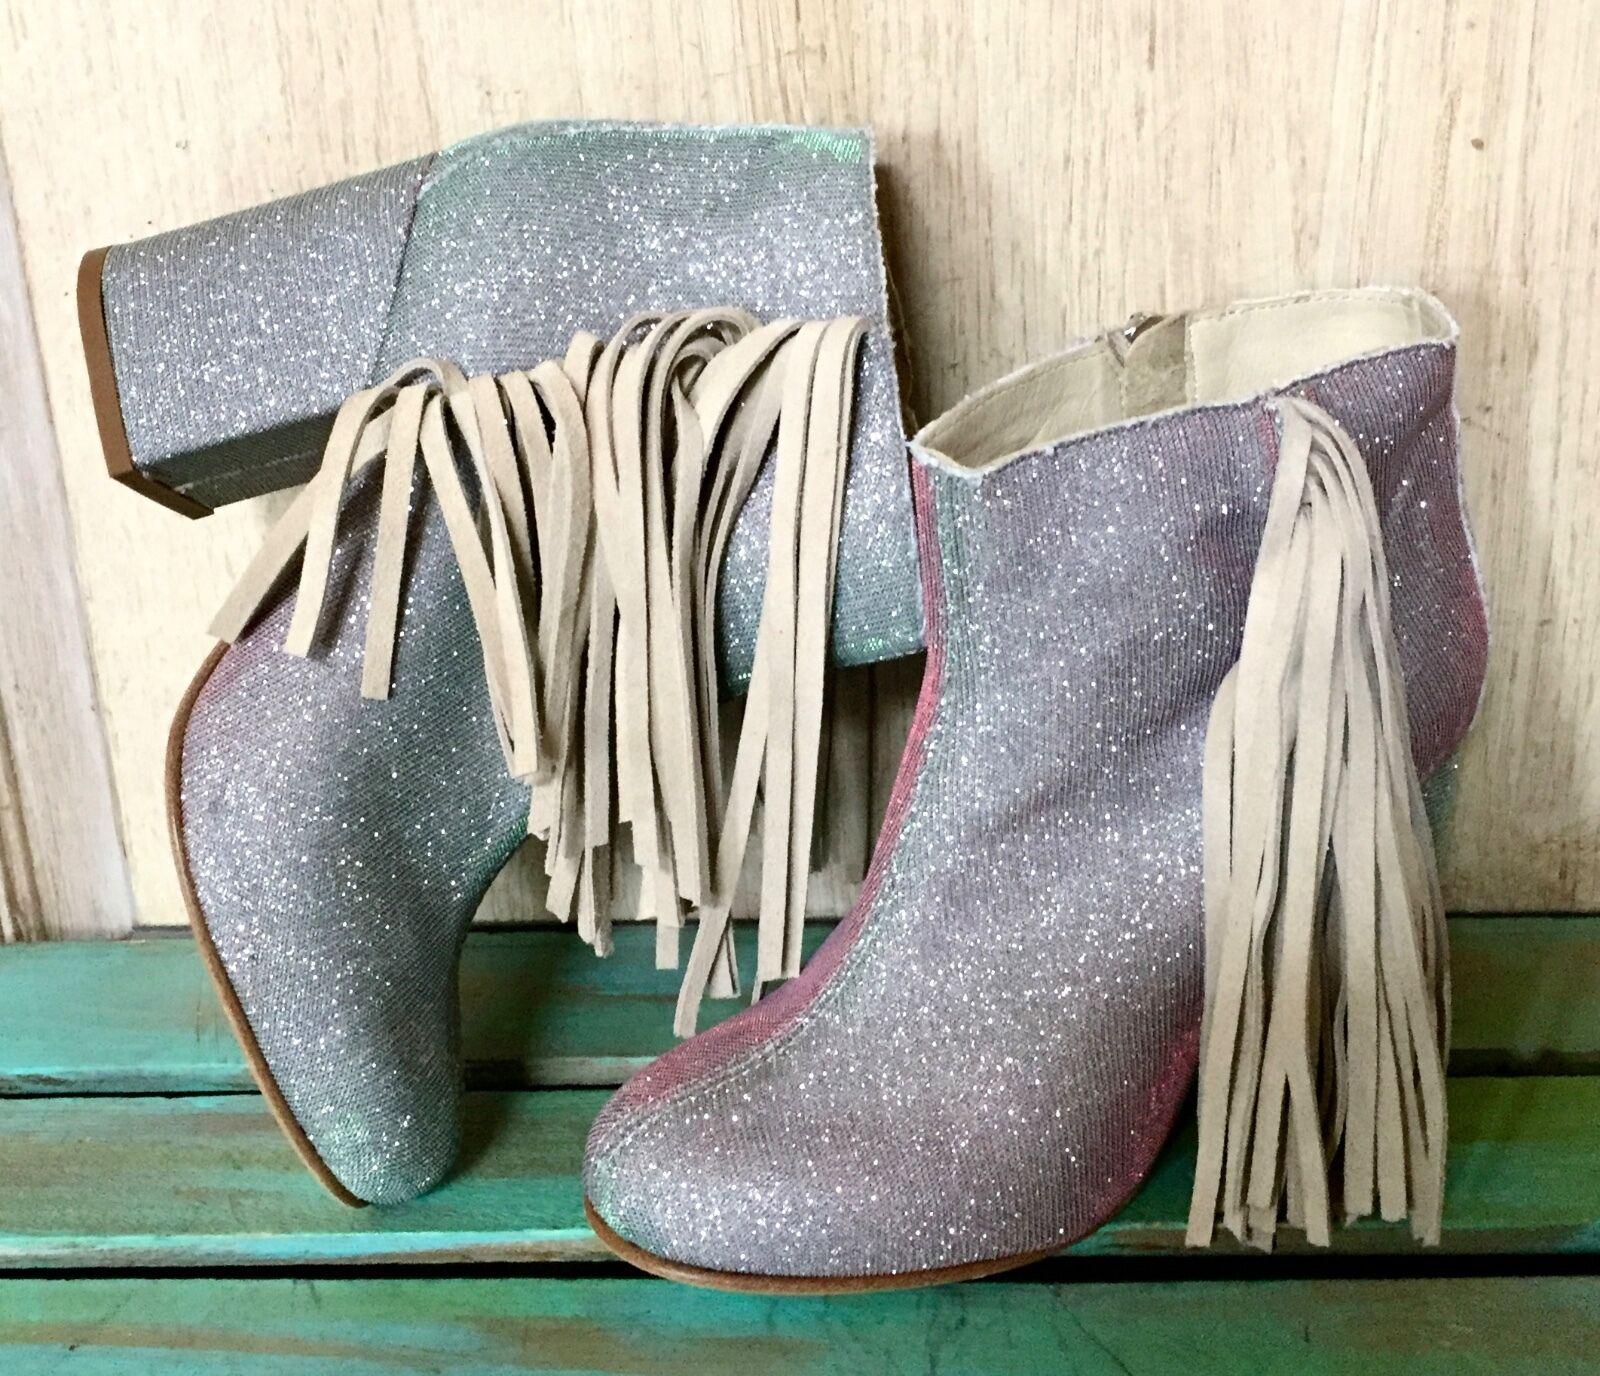 NEW Ouigal Silber Iridescent Stiefelies Suede Fringe Fringe Fringe Sides 37 6.5-7 29cc01